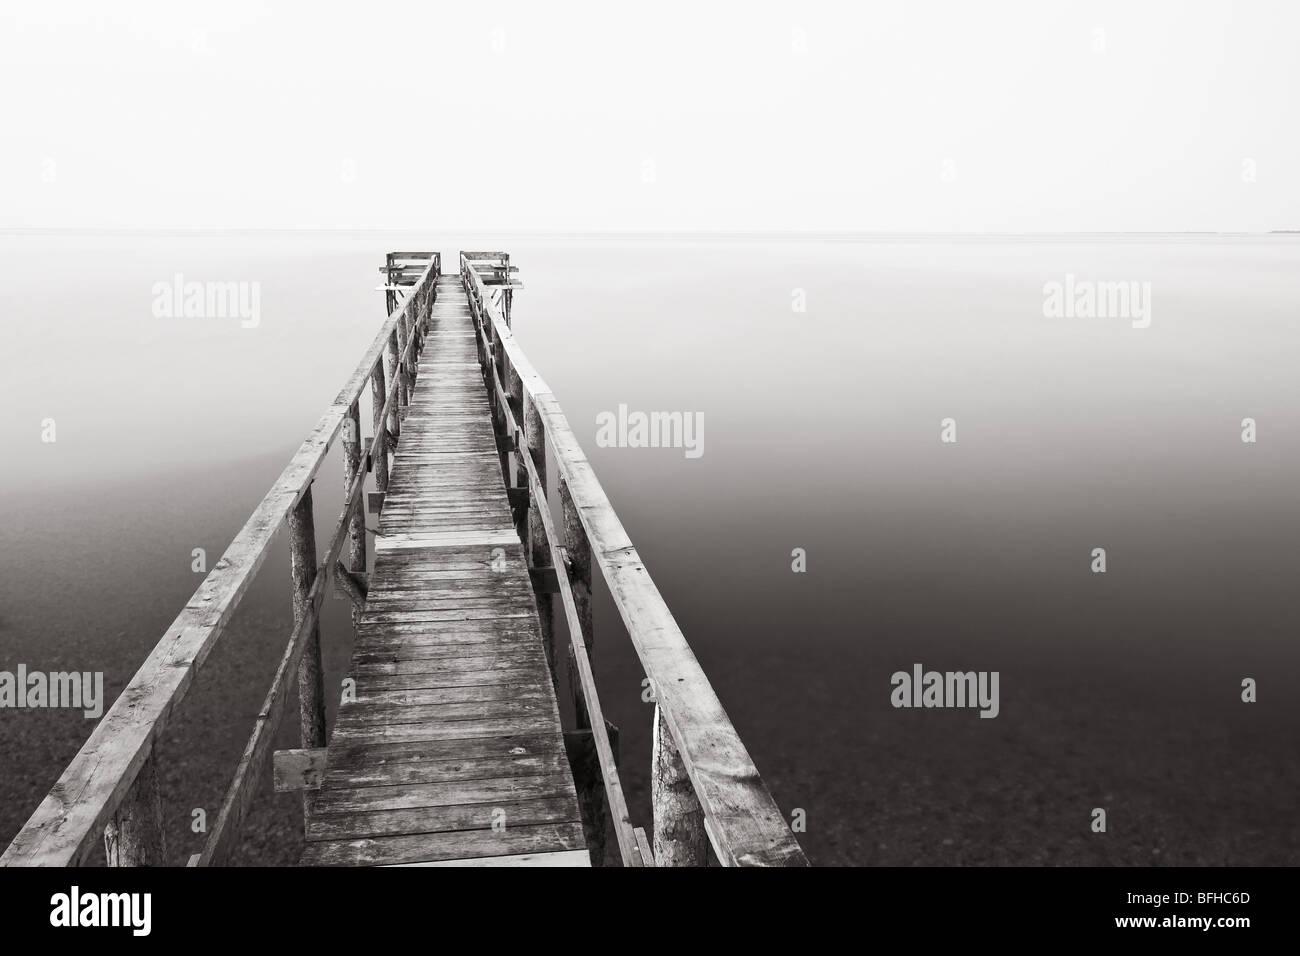 Wooden Pier on Lake Winnipeg.  Rebuilt every spring due to the Lake freezing solid.  Matlock, Manitoba, Canada. - Stock Image